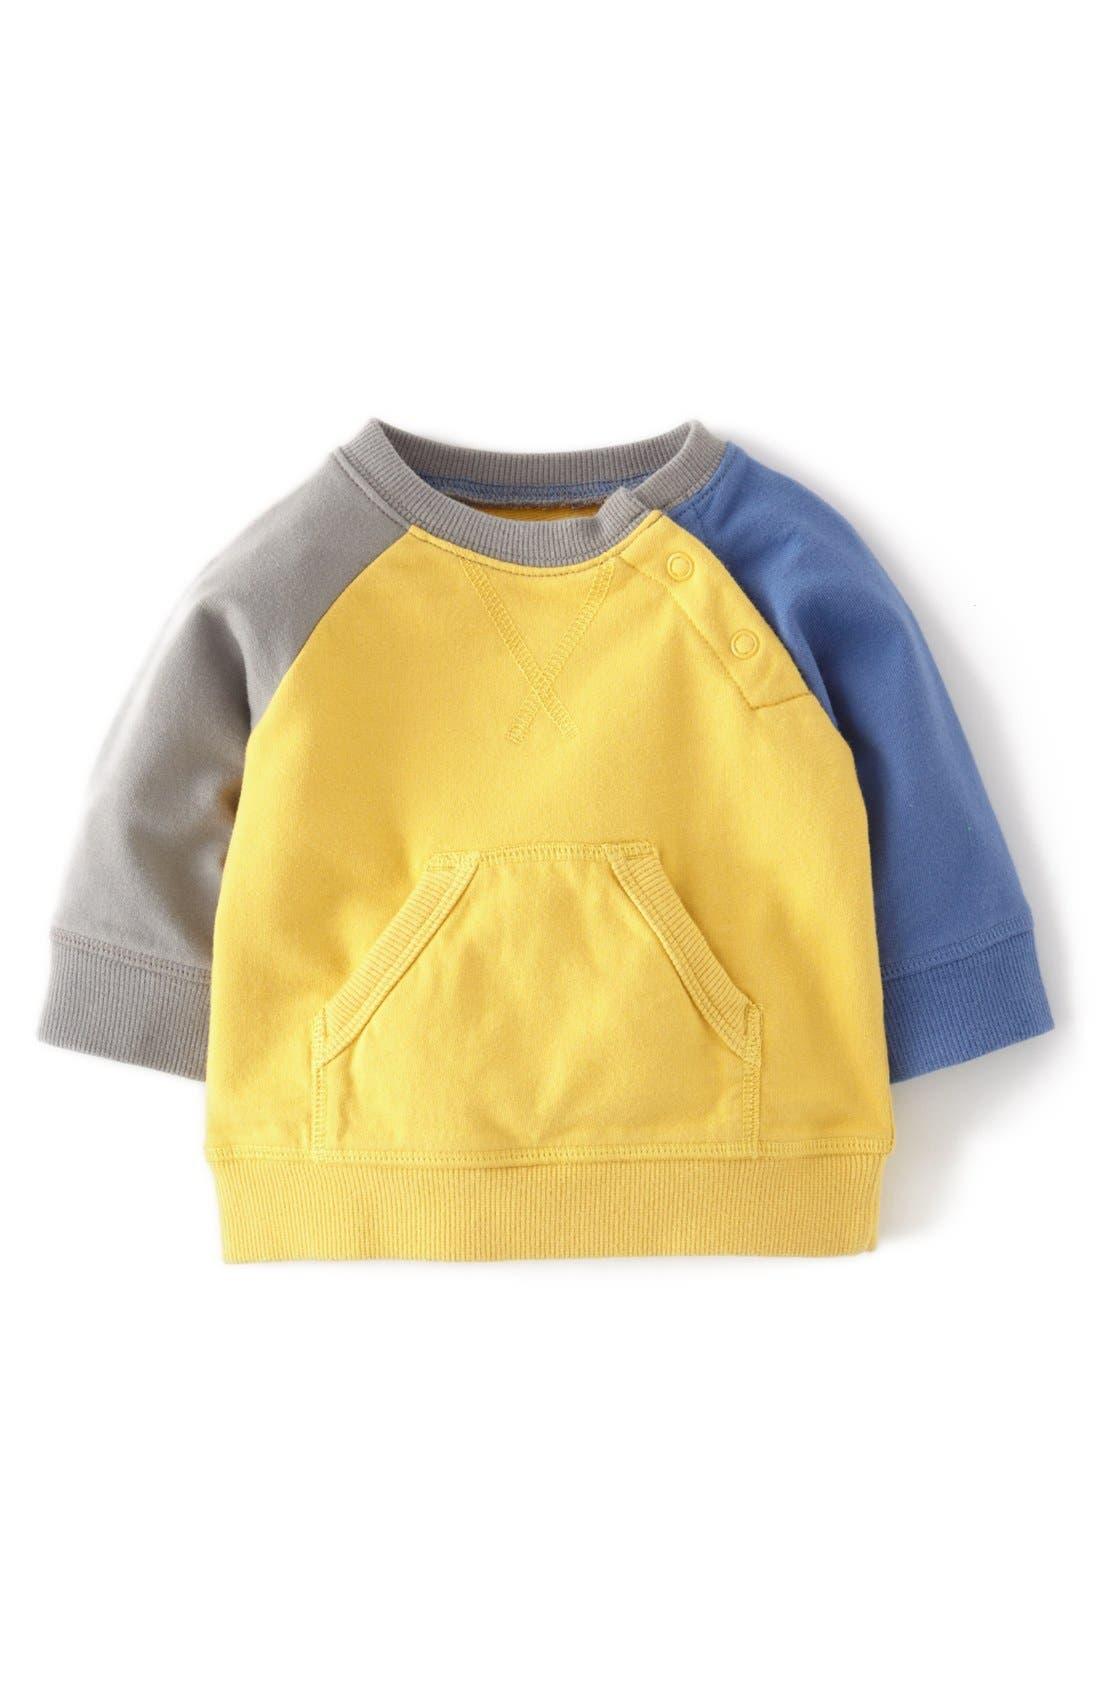 Alternate Image 1 Selected - Mini Boden 'Hotchpotch' Sweatshirt (Baby Boys)